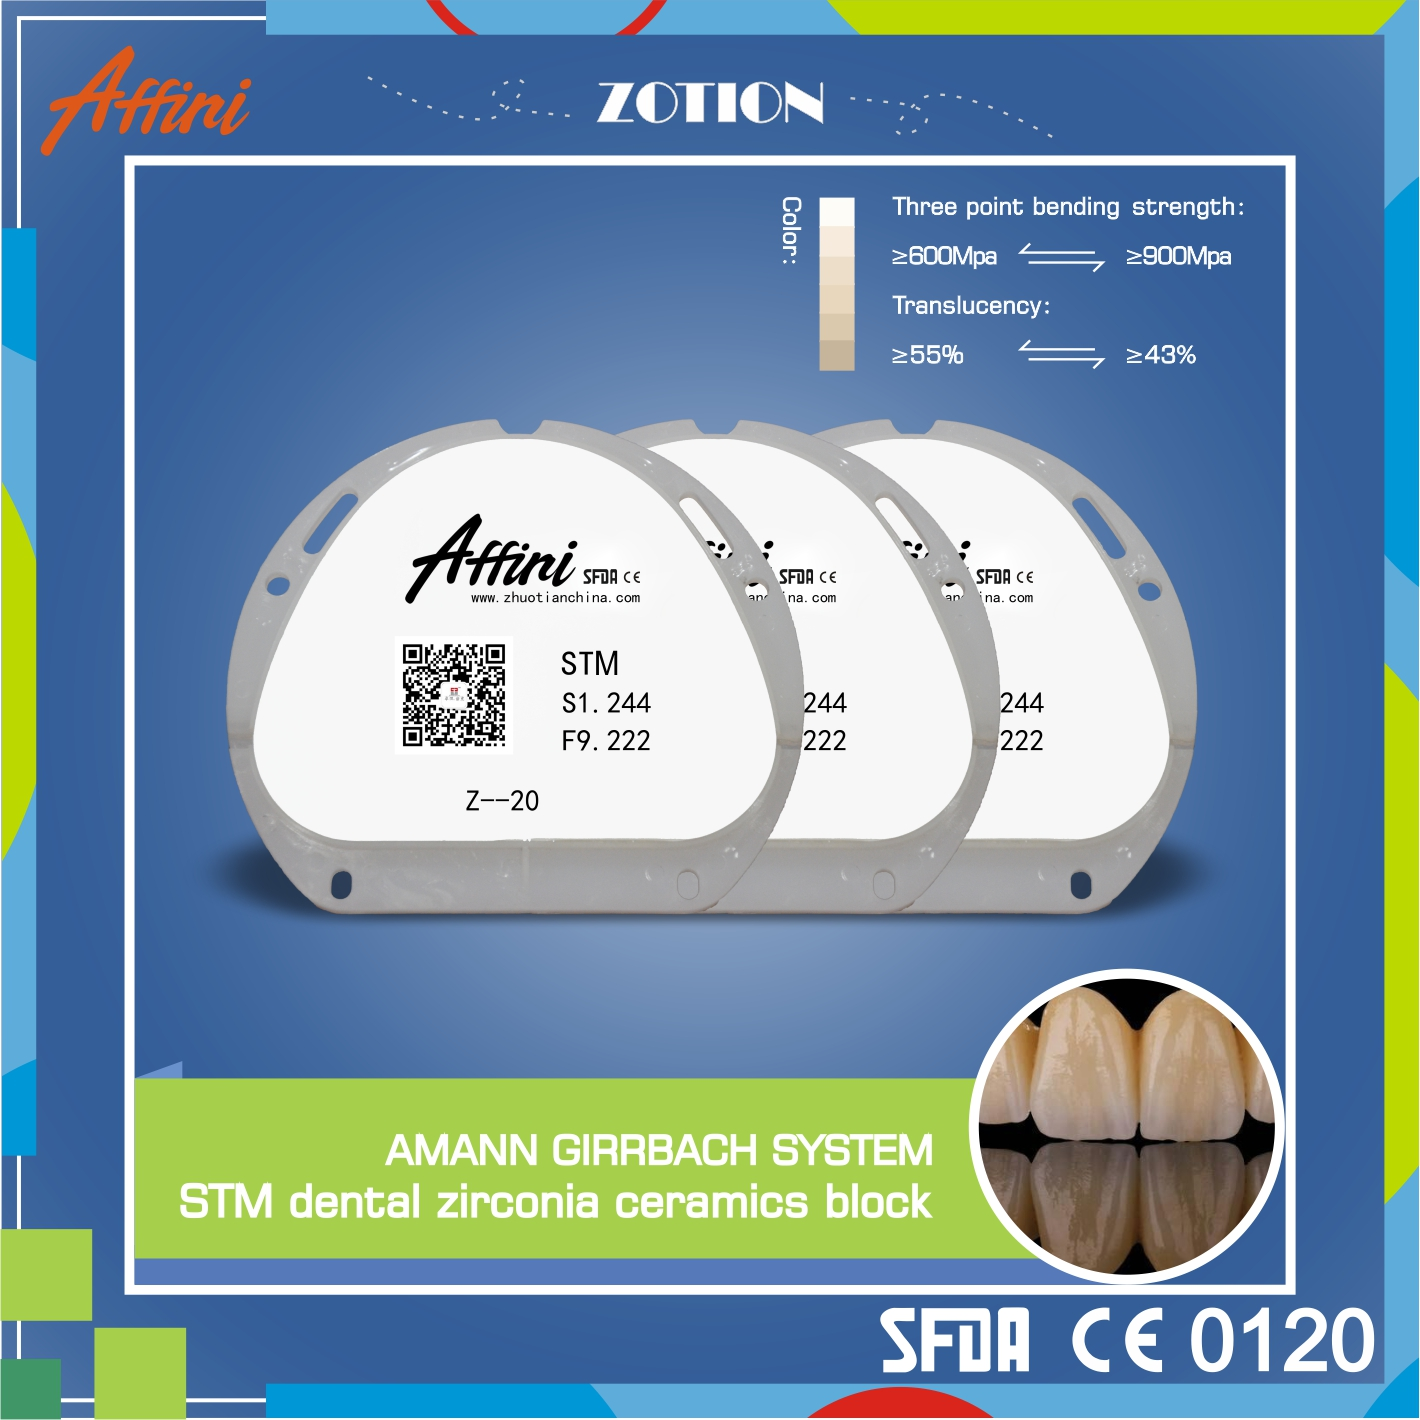 Pre-Colored Zirconia Blanks CAD/CAM Zirconia Milling Discs Dental Zirconia DiskZirconia Milling Disc